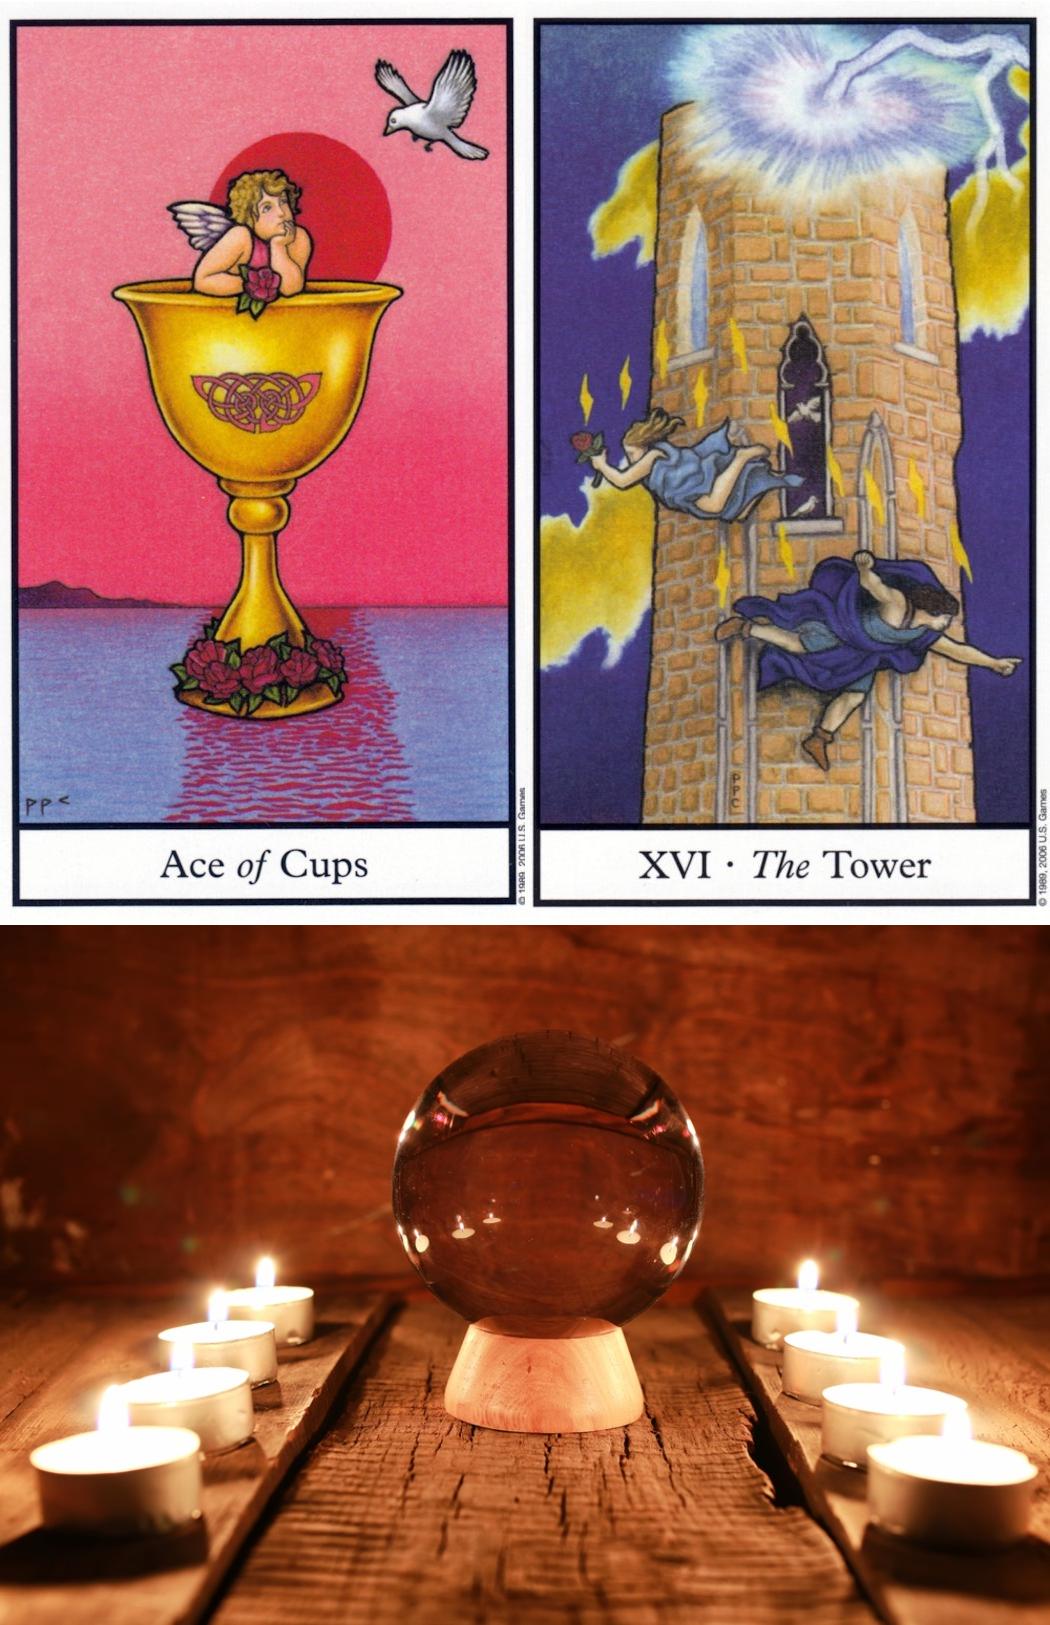 b093d4ae95c47d free full tarot reading online, online card reading and tarot card reading  in hindi 2016, free tarot card reading lotus and tarot online español.